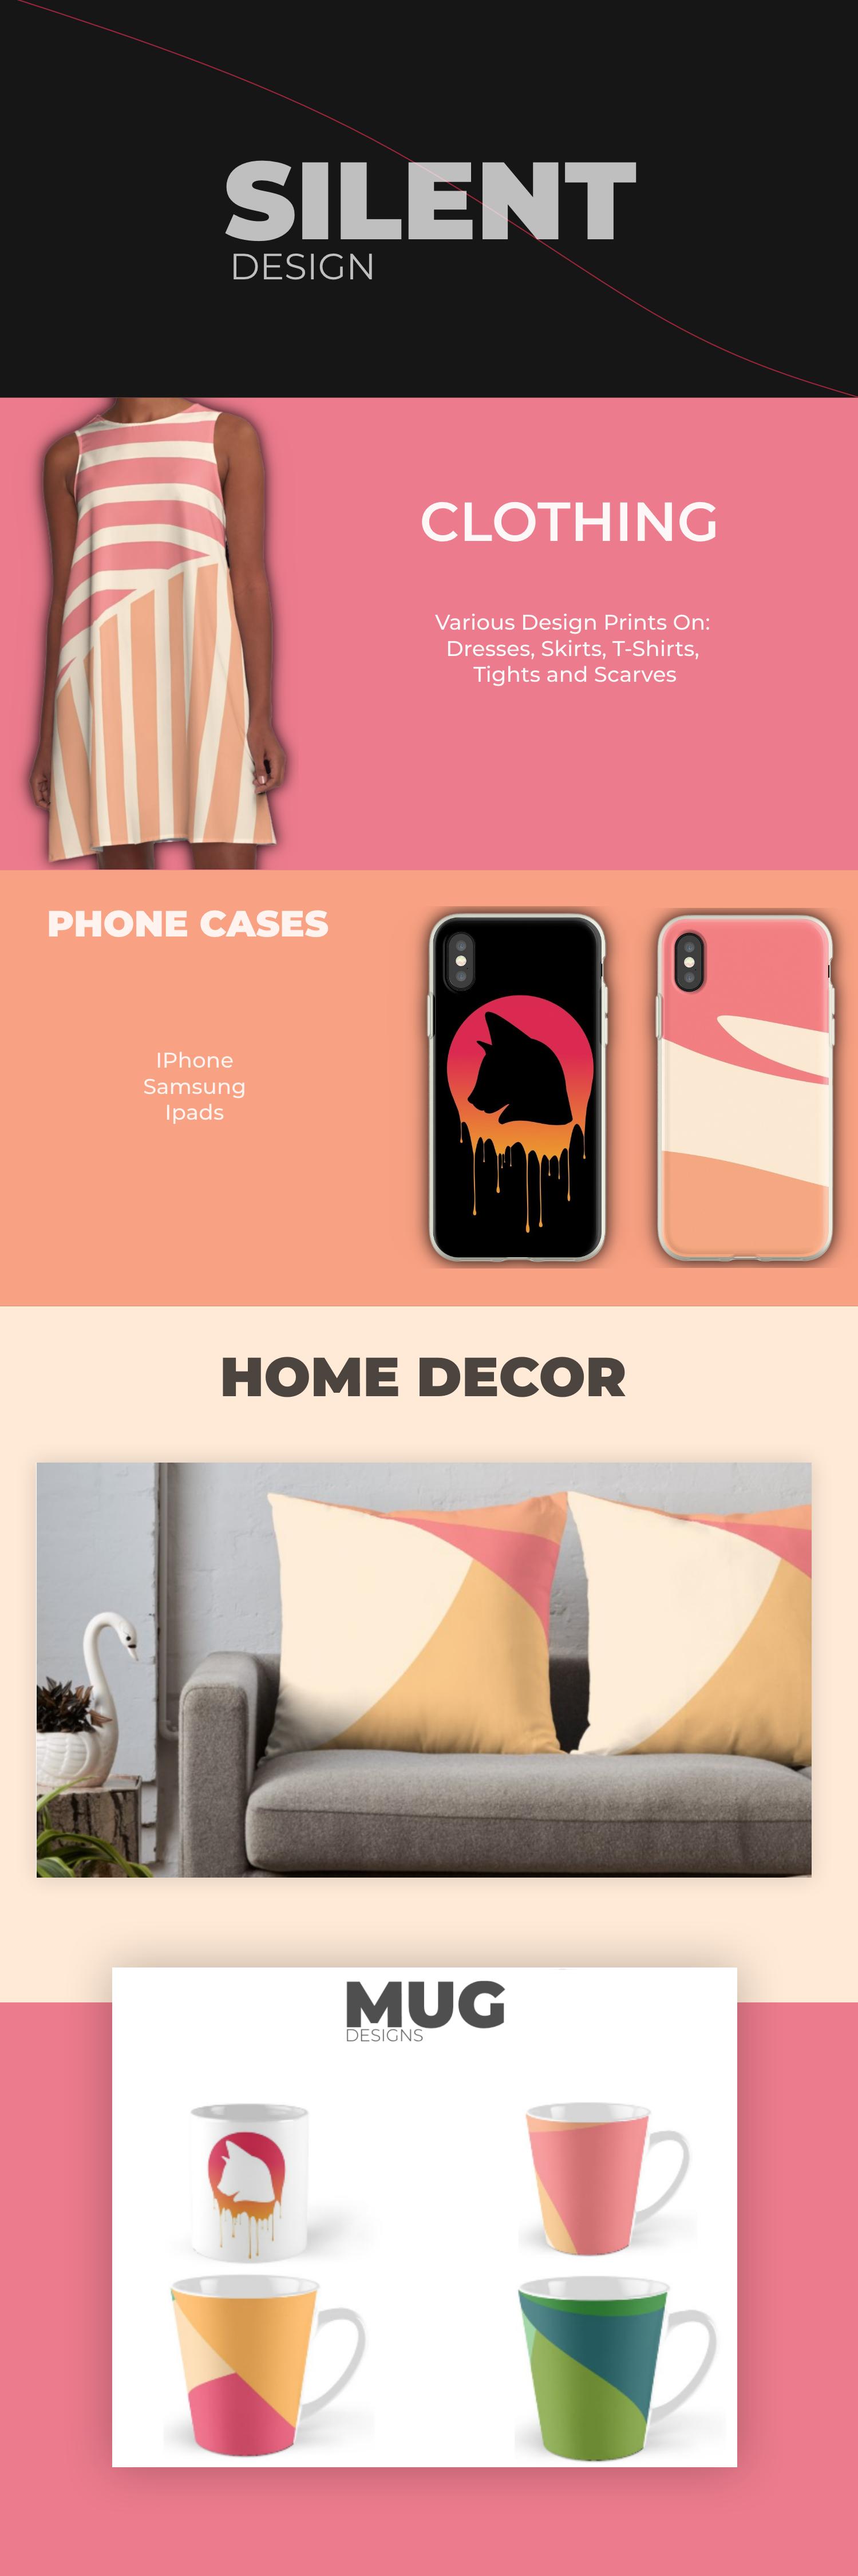 Silentvalley Shop Redbubble Web Design Simple Brochures Design